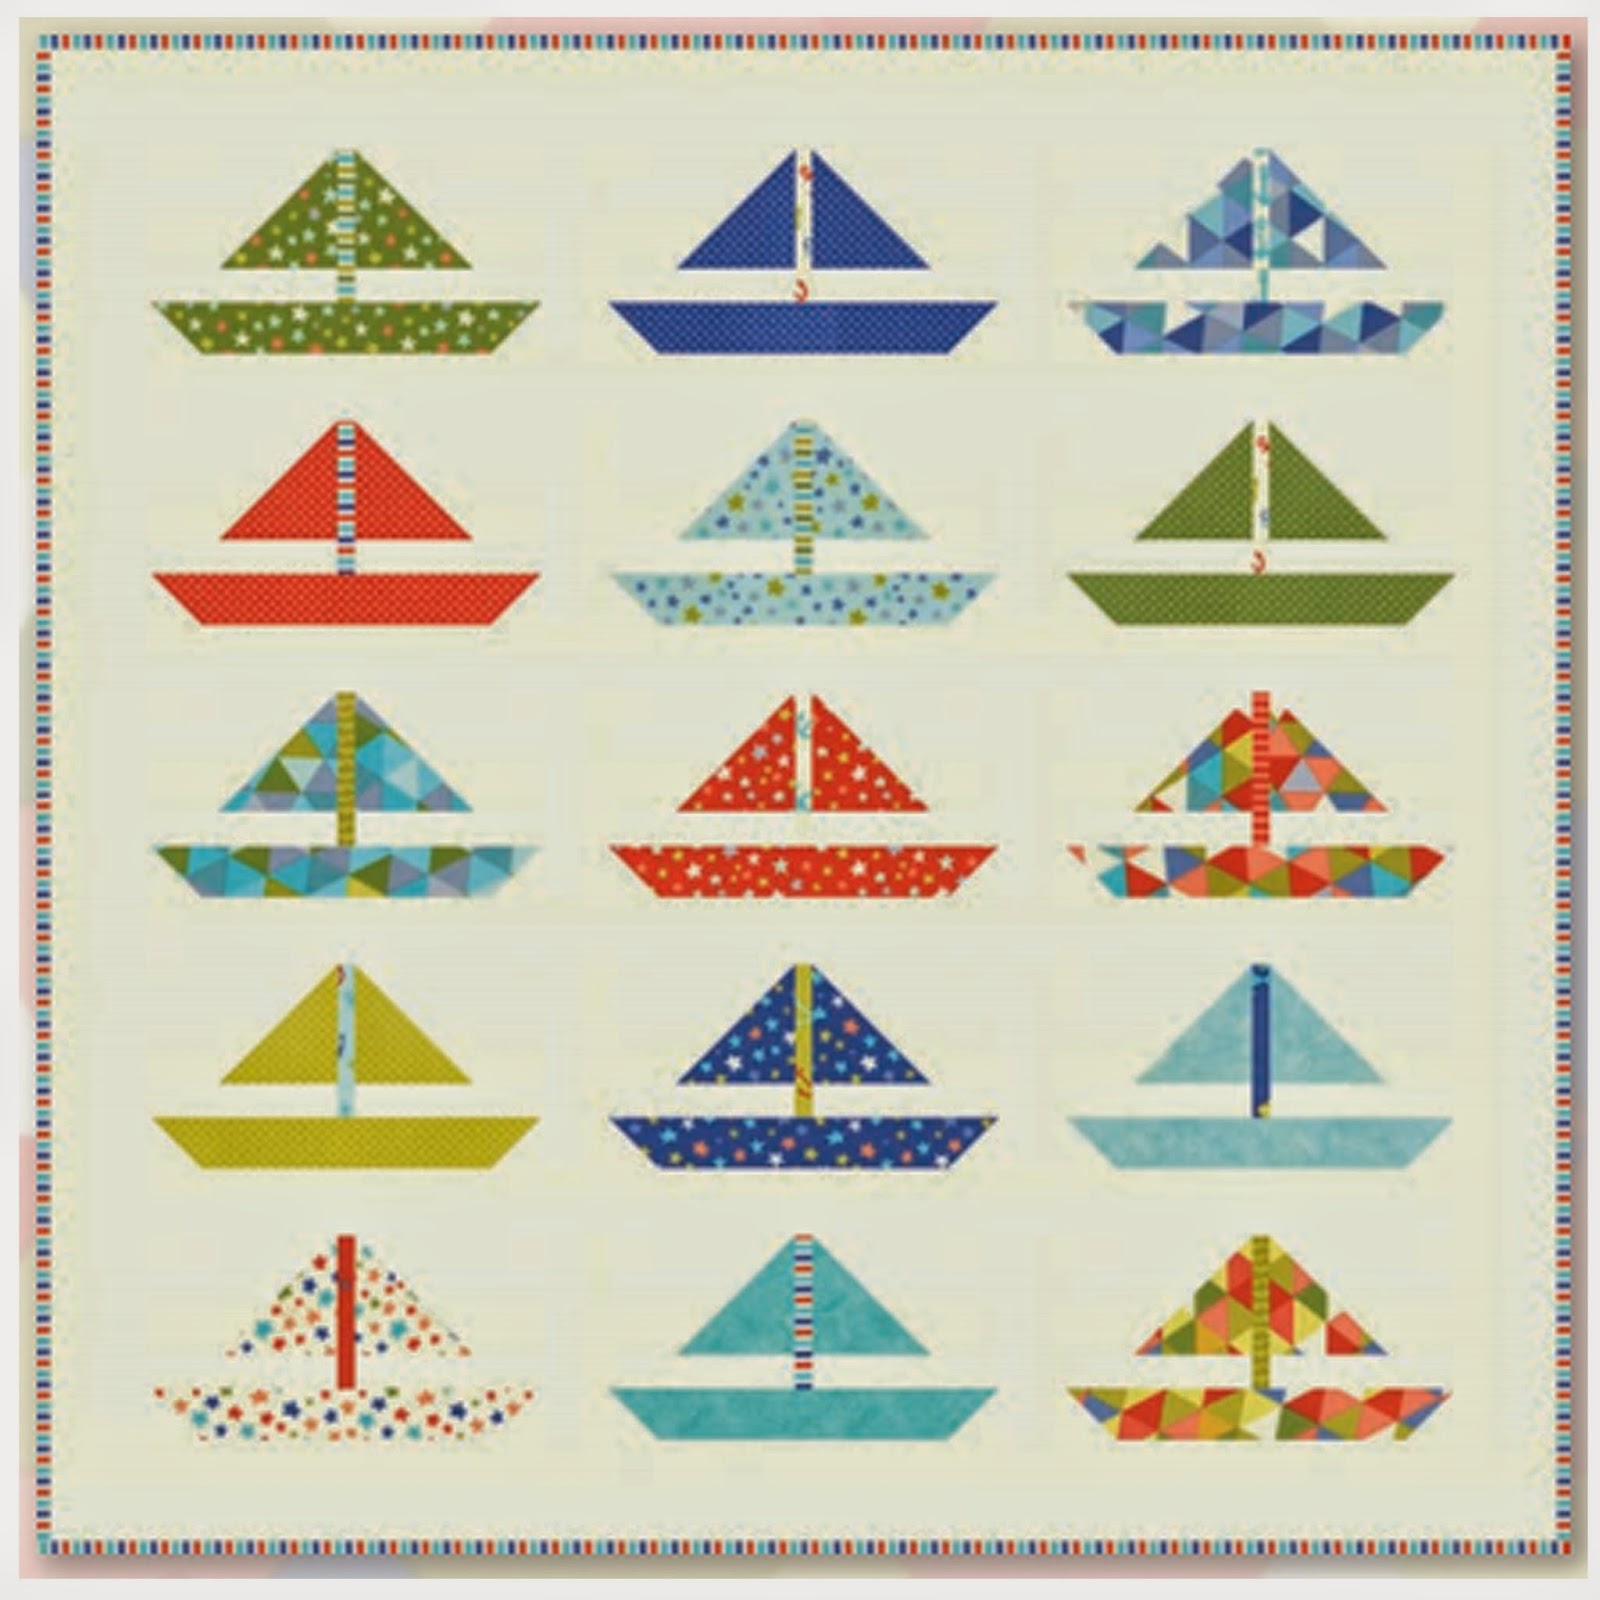 Moda BARTHOLO-MEOW'S REEF Free Quilt pattern